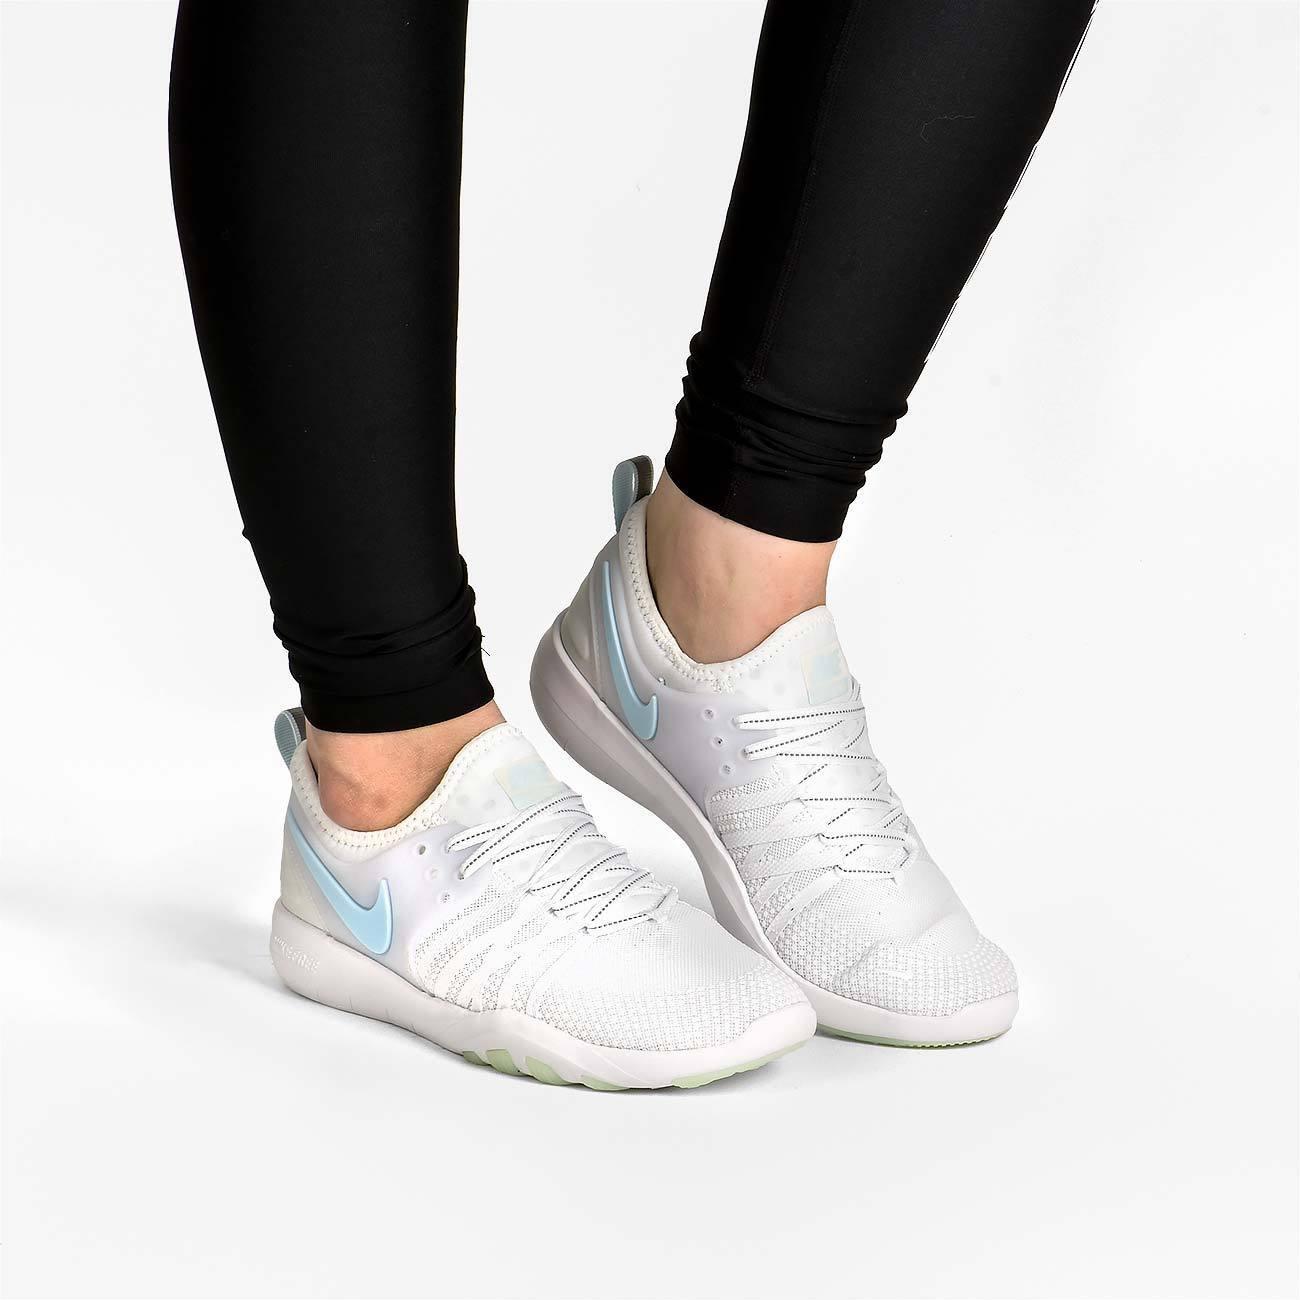 Da Donna Nike Free TR 7 riflettono Taglia 6.5 EUR 40.5 (AA2238 100) Ghiacciaio BLU